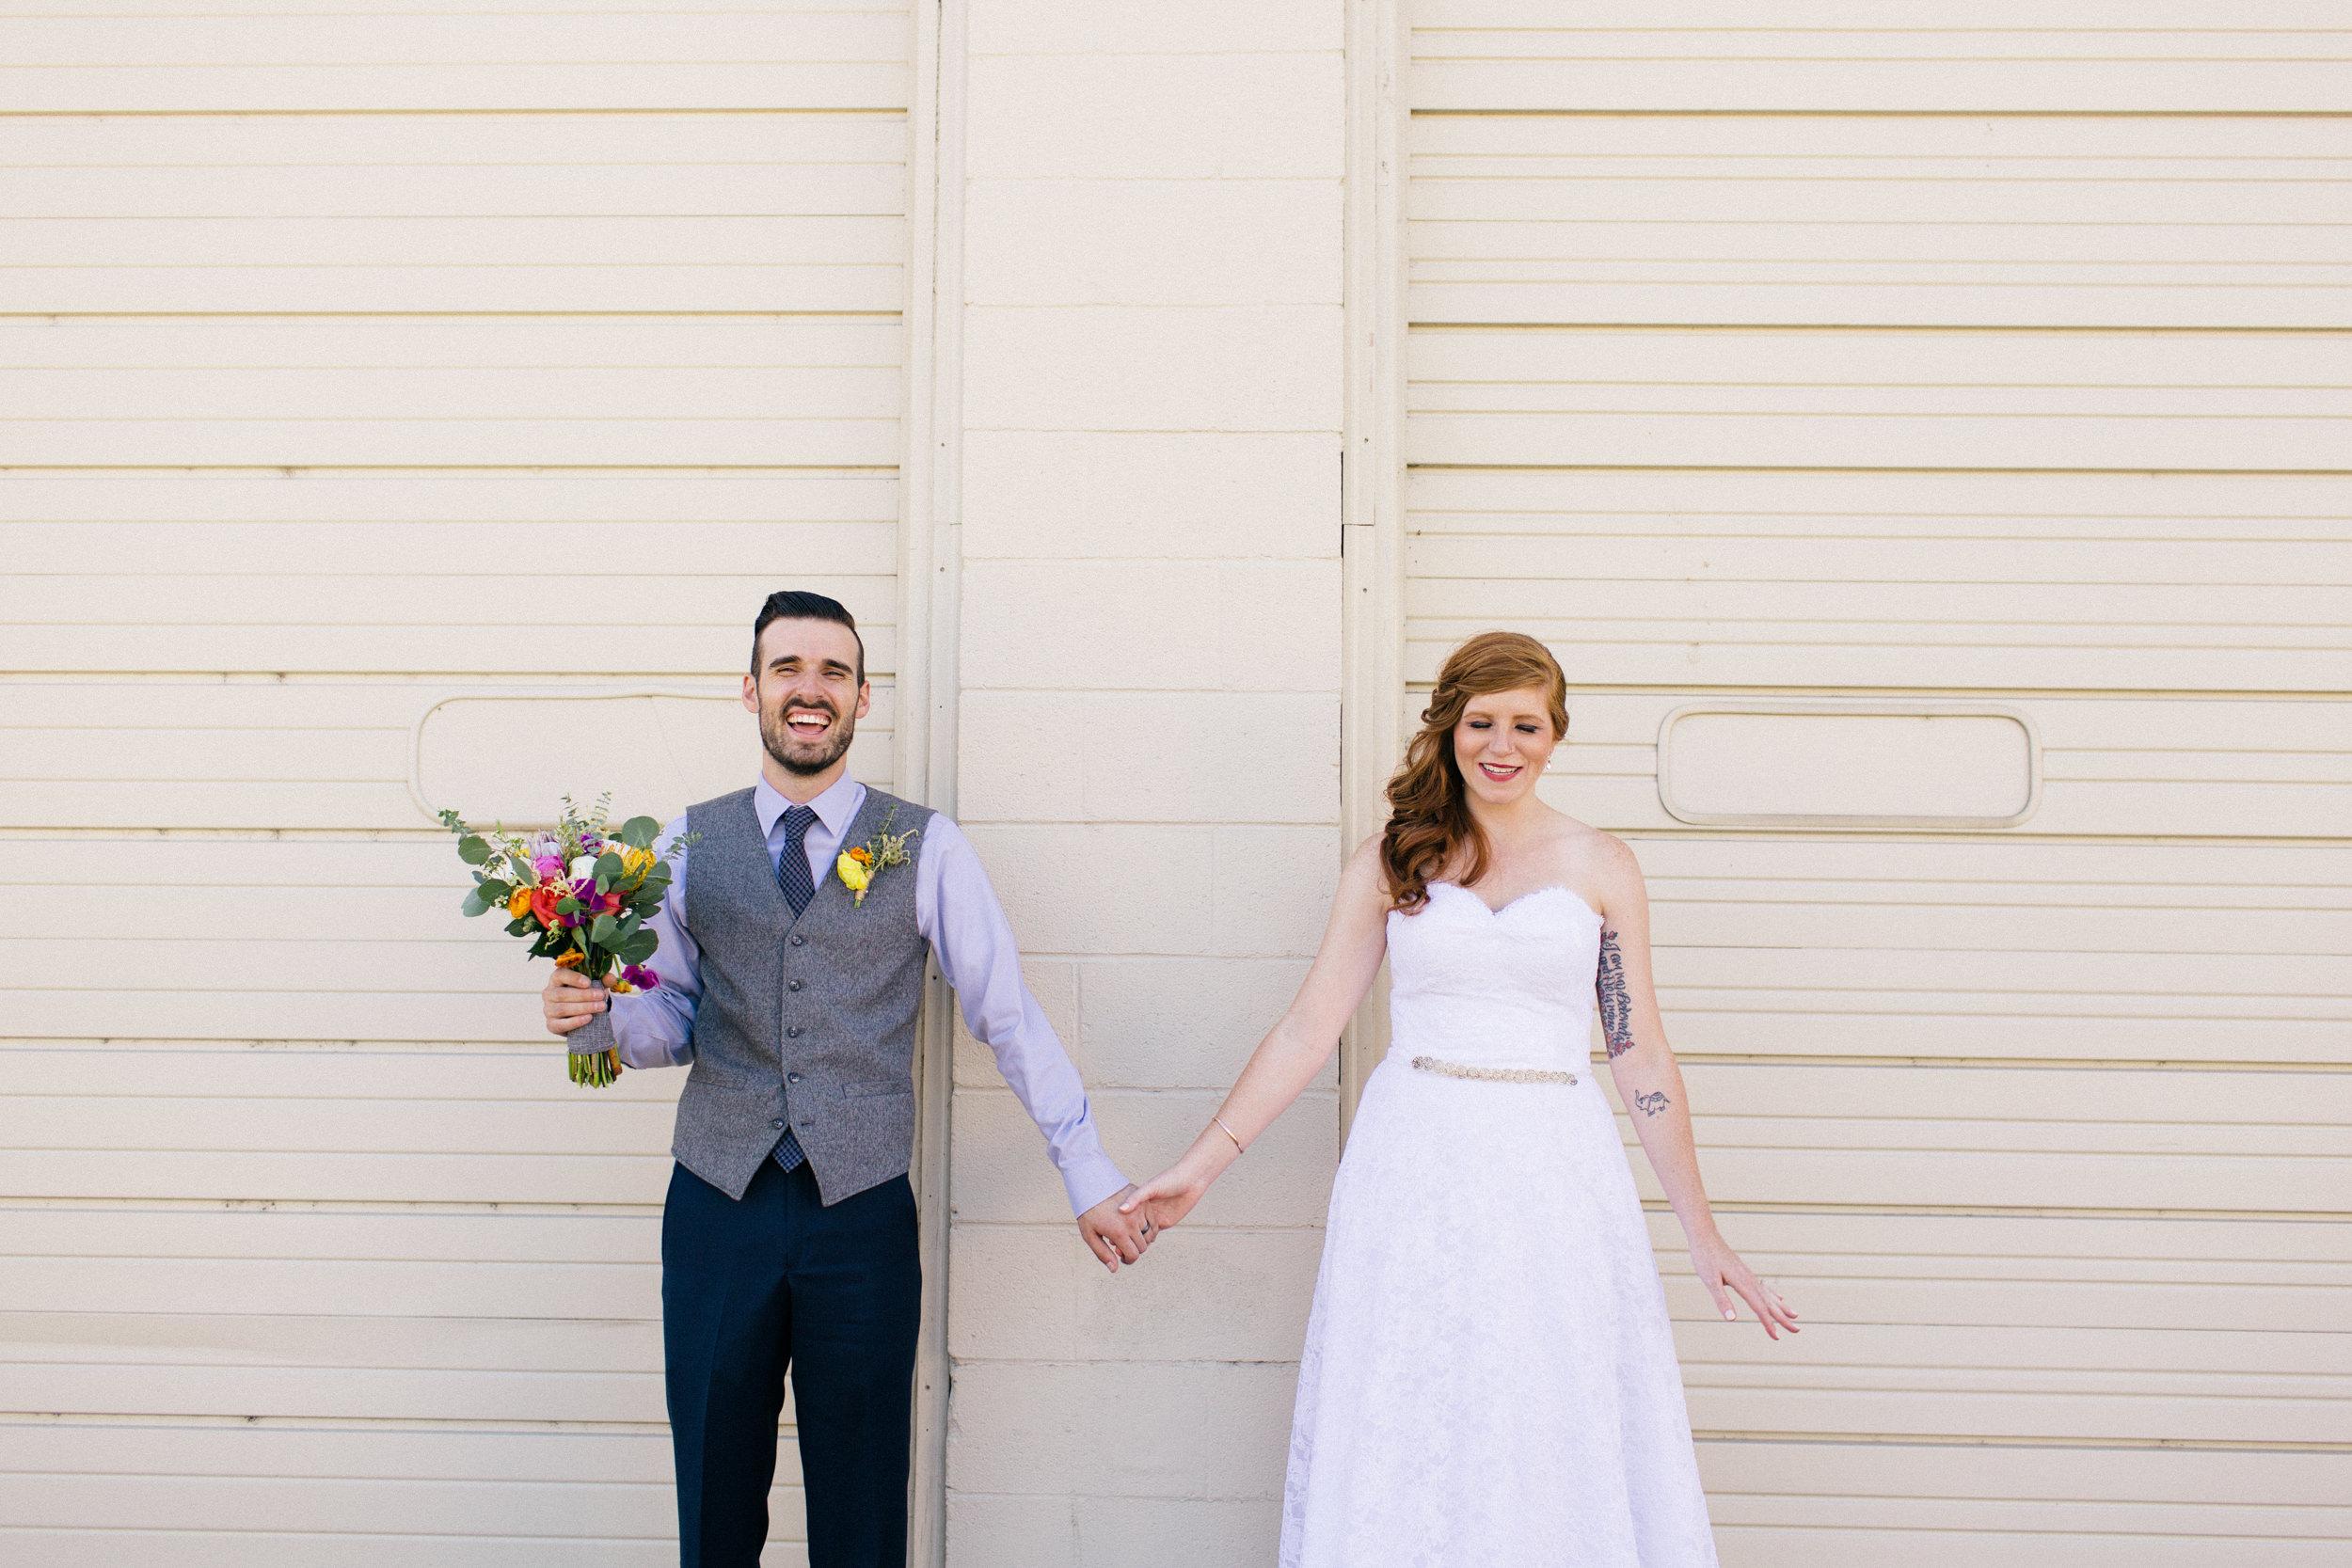 7-25-2015 Sarah and Jimmy's Eagle Ridge Downtown Galena Wedding-169.jpg